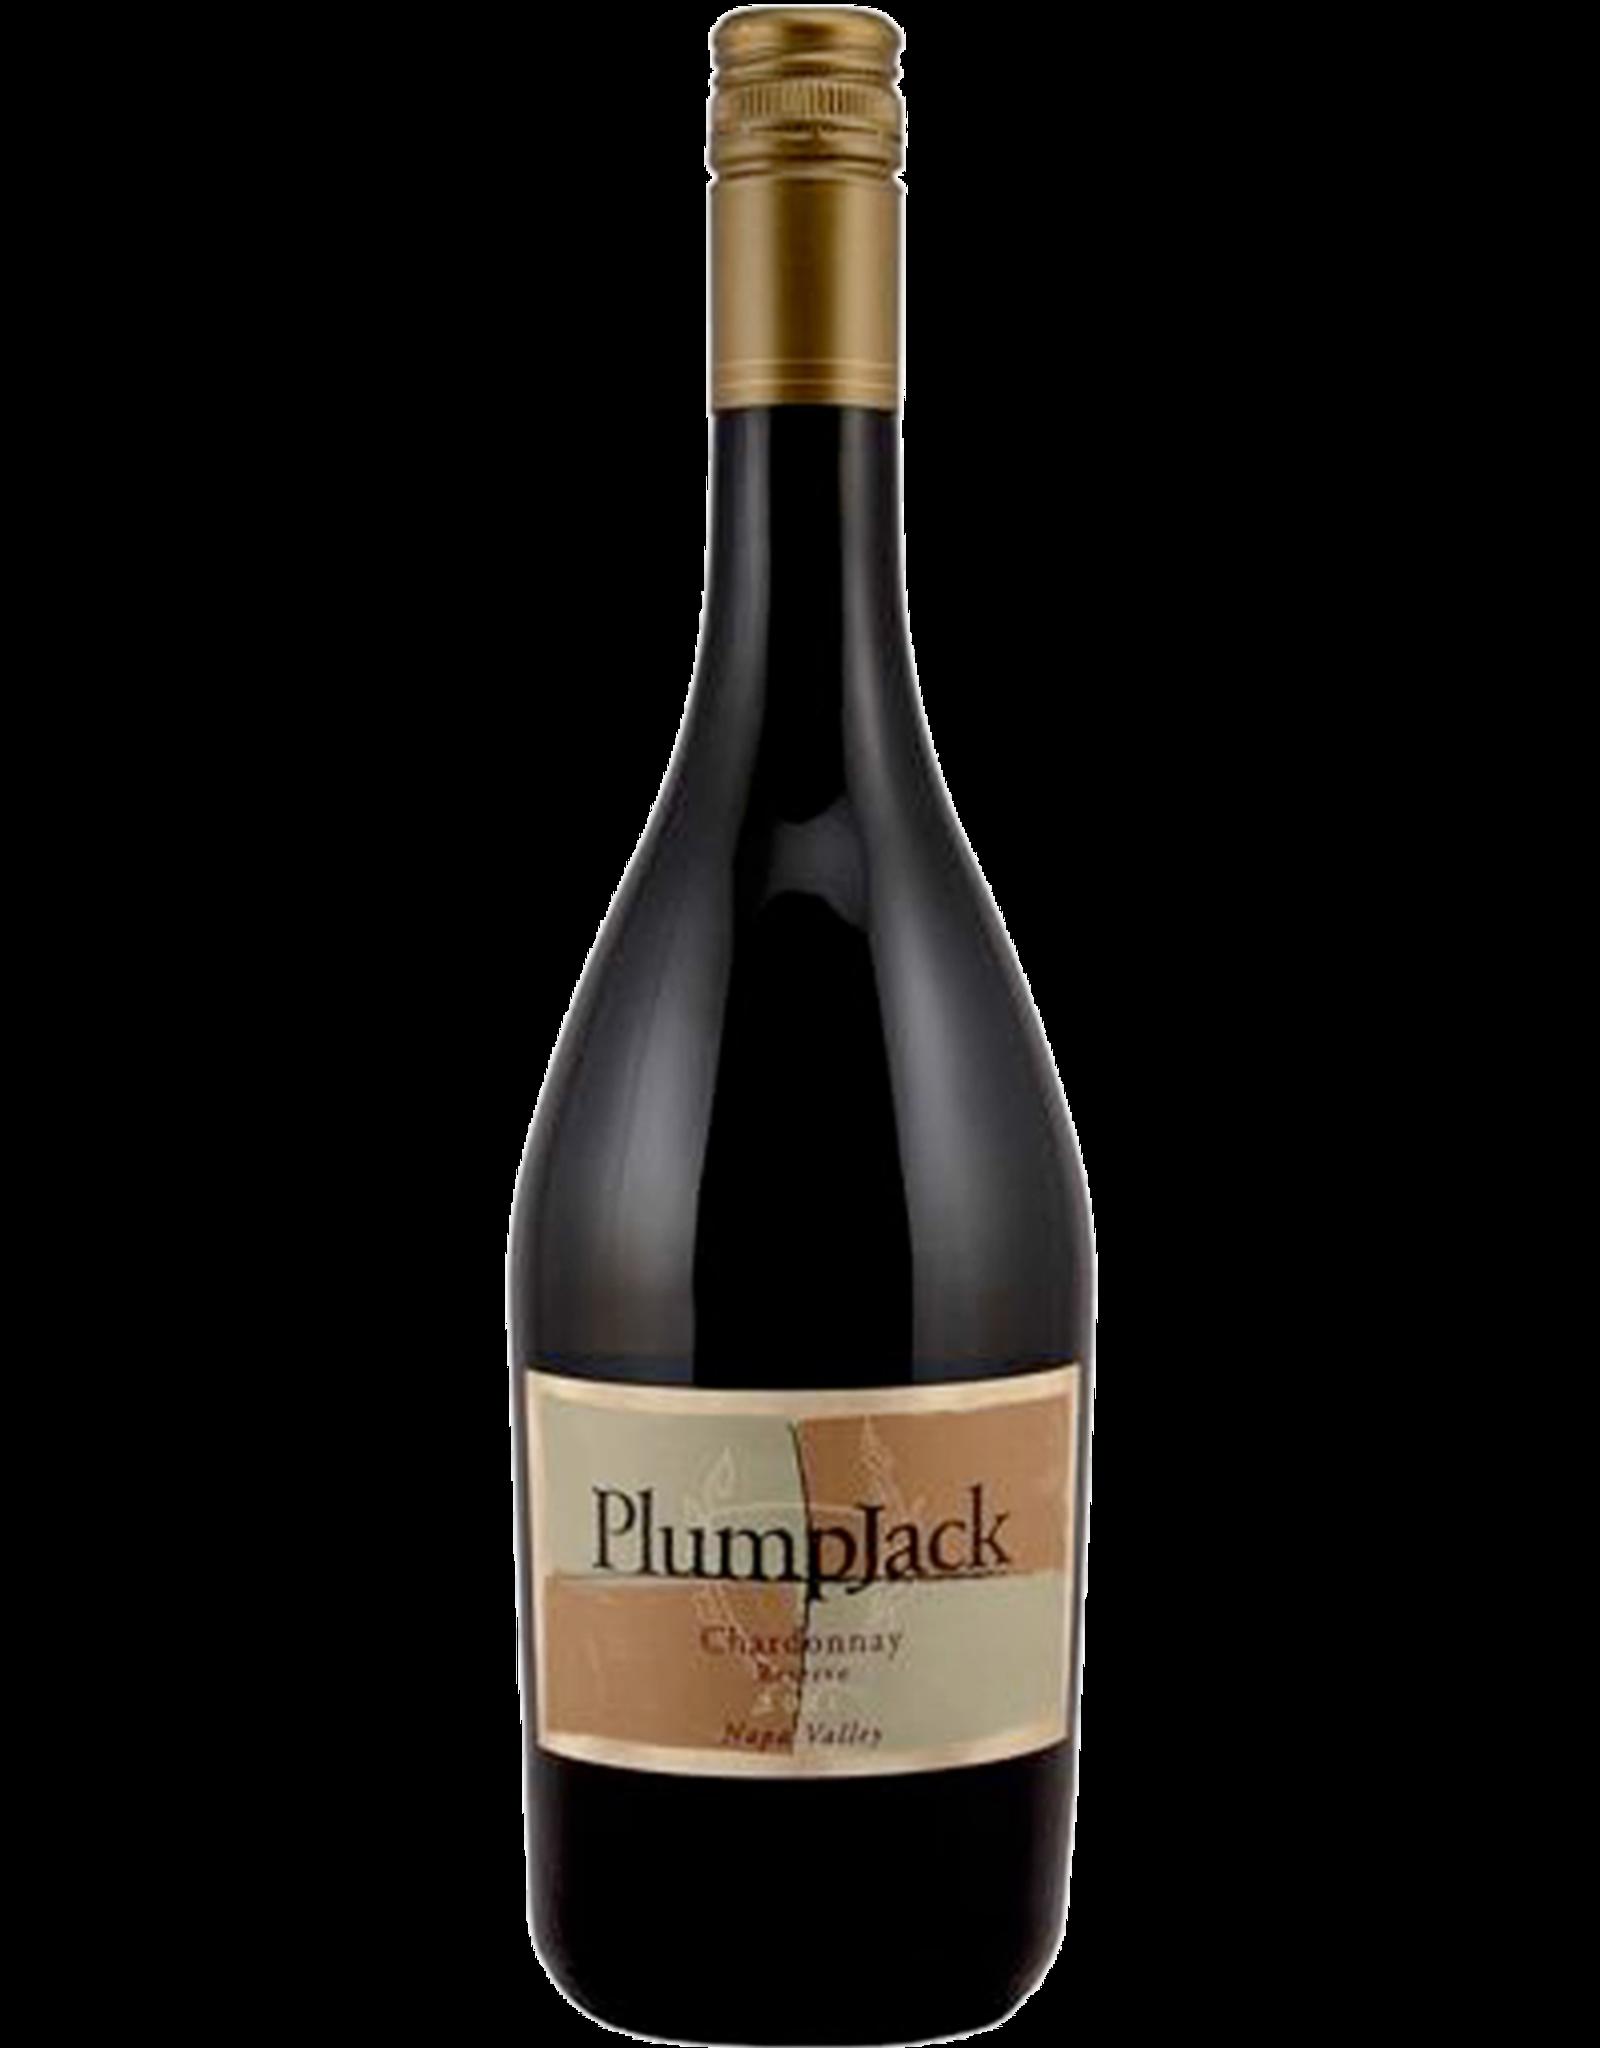 Plumpjack Reserve Chardonnay Napa 2017